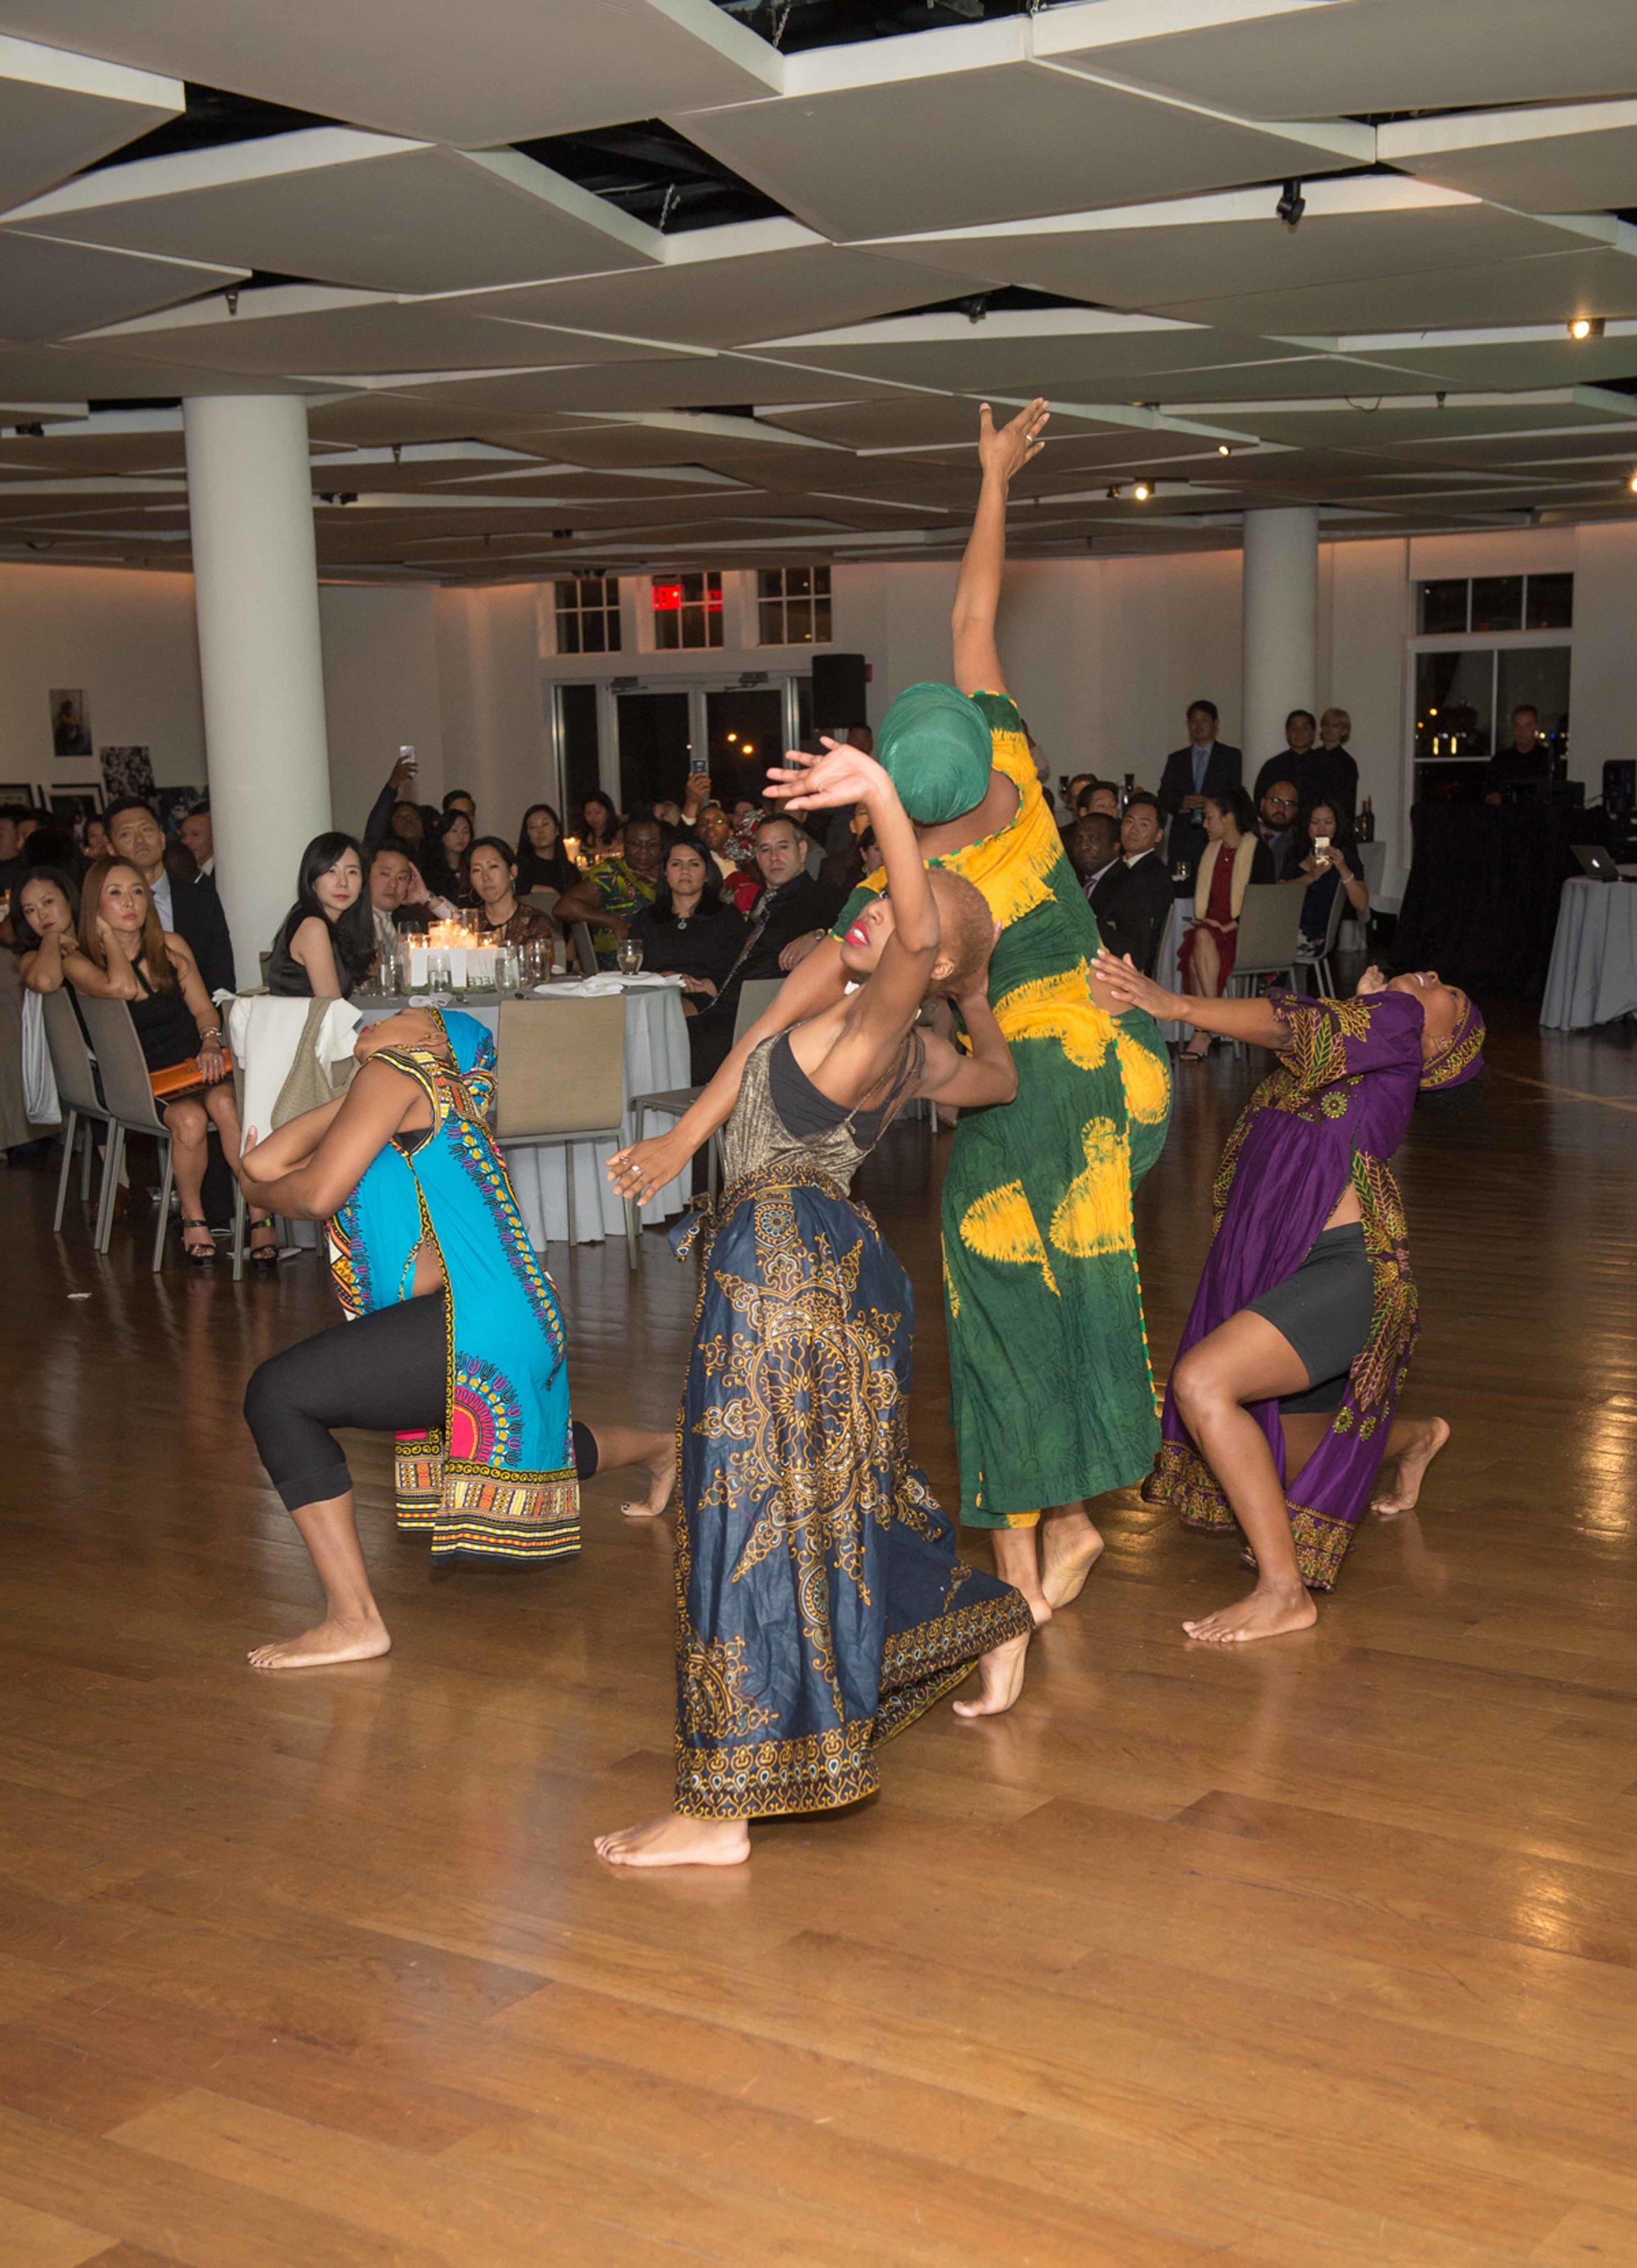 2017-10-21 Zimele USA 6th Annual Gala - Maritime Parc - Jersey City NJ_0272.jpg